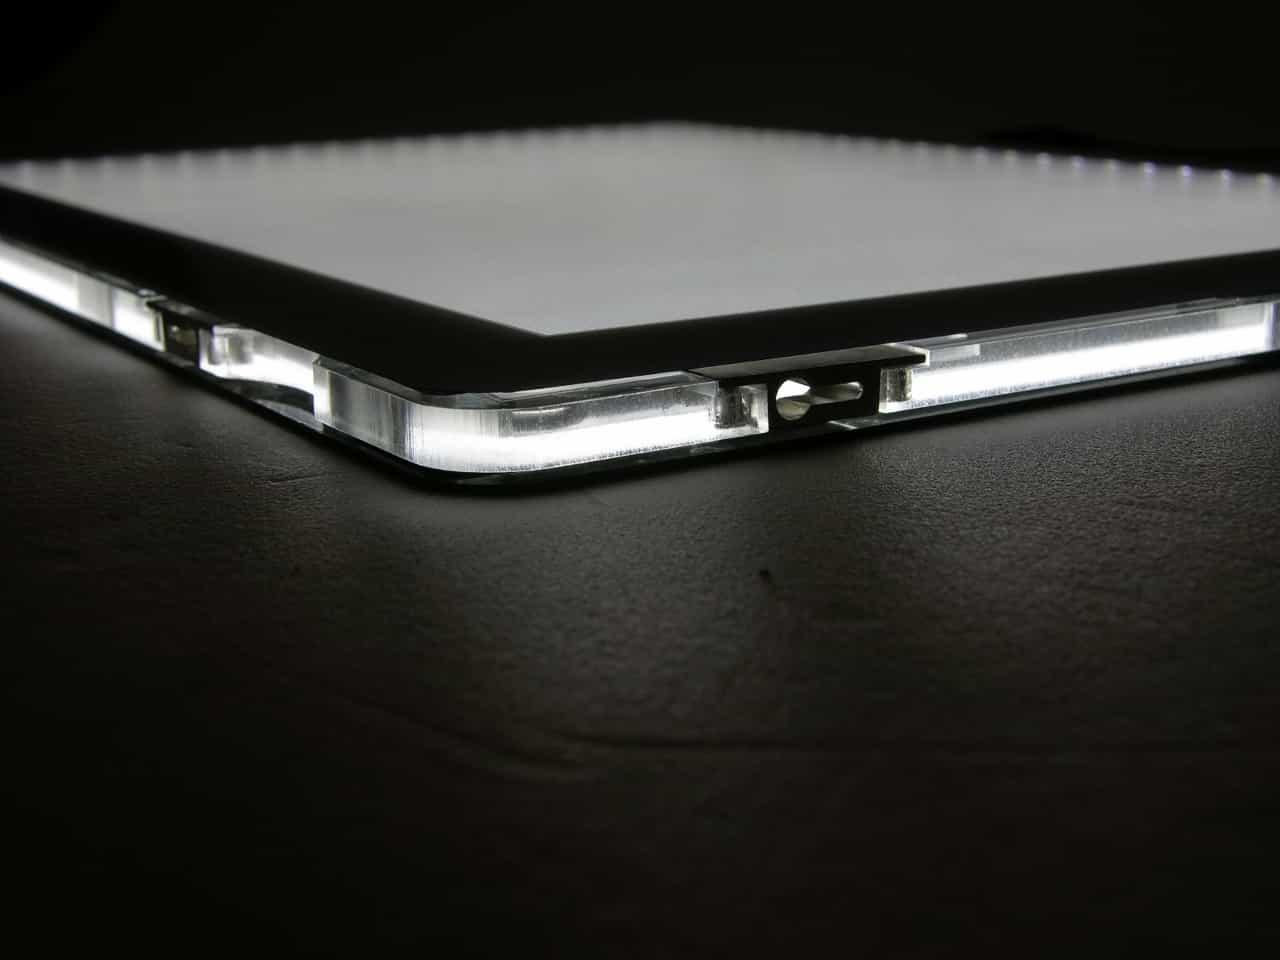 Pannelli retroilluminati a LED